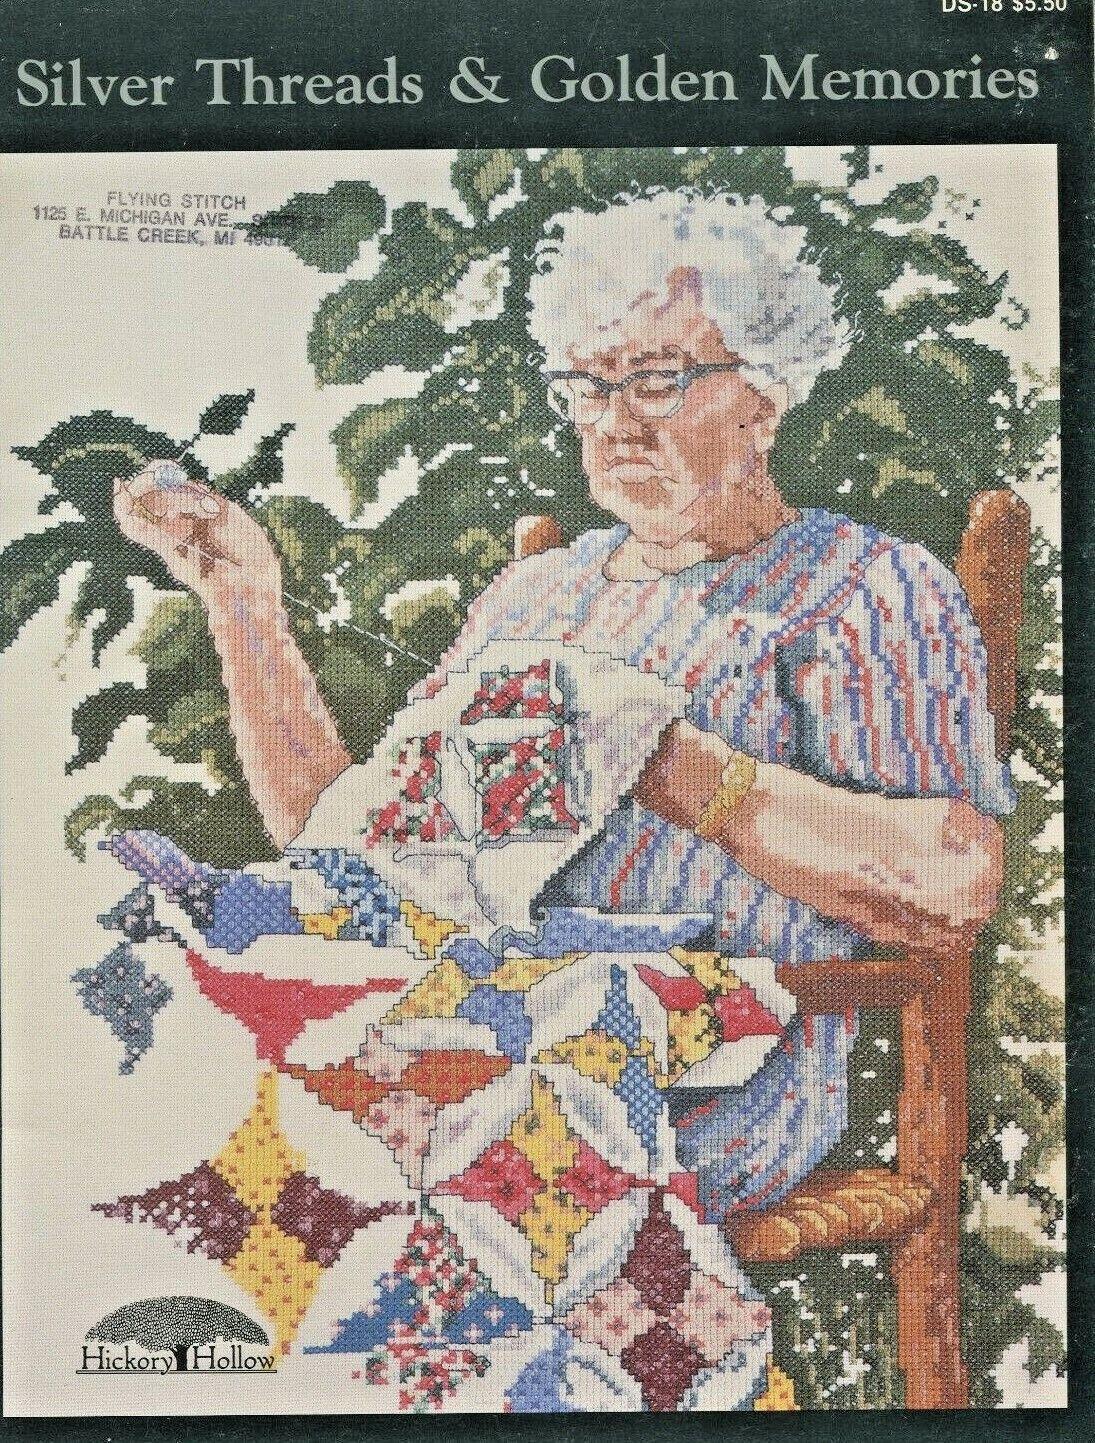 Silver Threads Golden Memories 8 Cross Stitch Pattern 1987 Hickory Hollow - $4.99